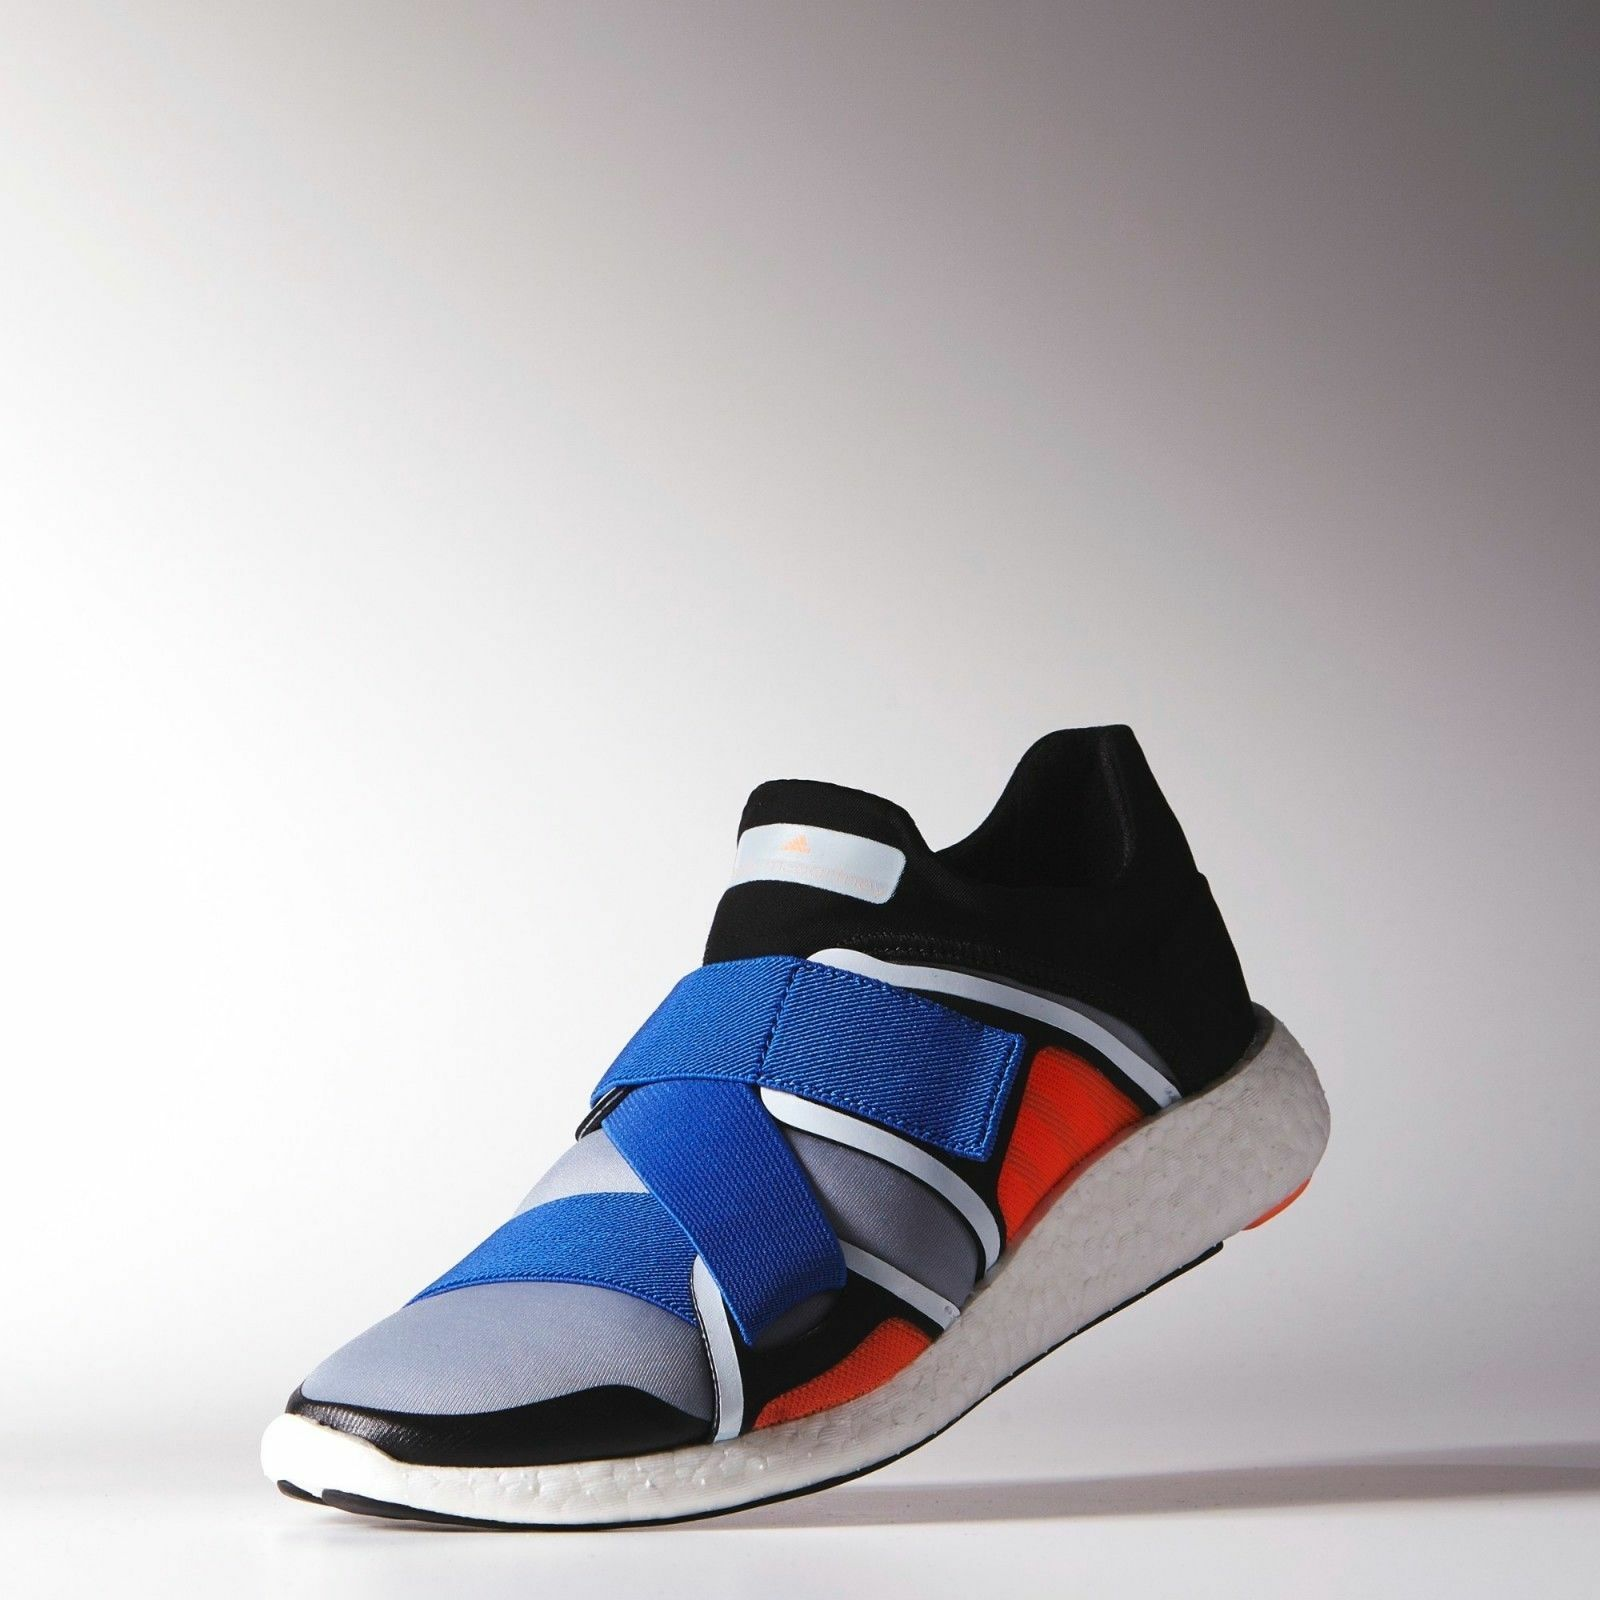 Adidas Pure Boost by Stella McCartney Women Running M19103